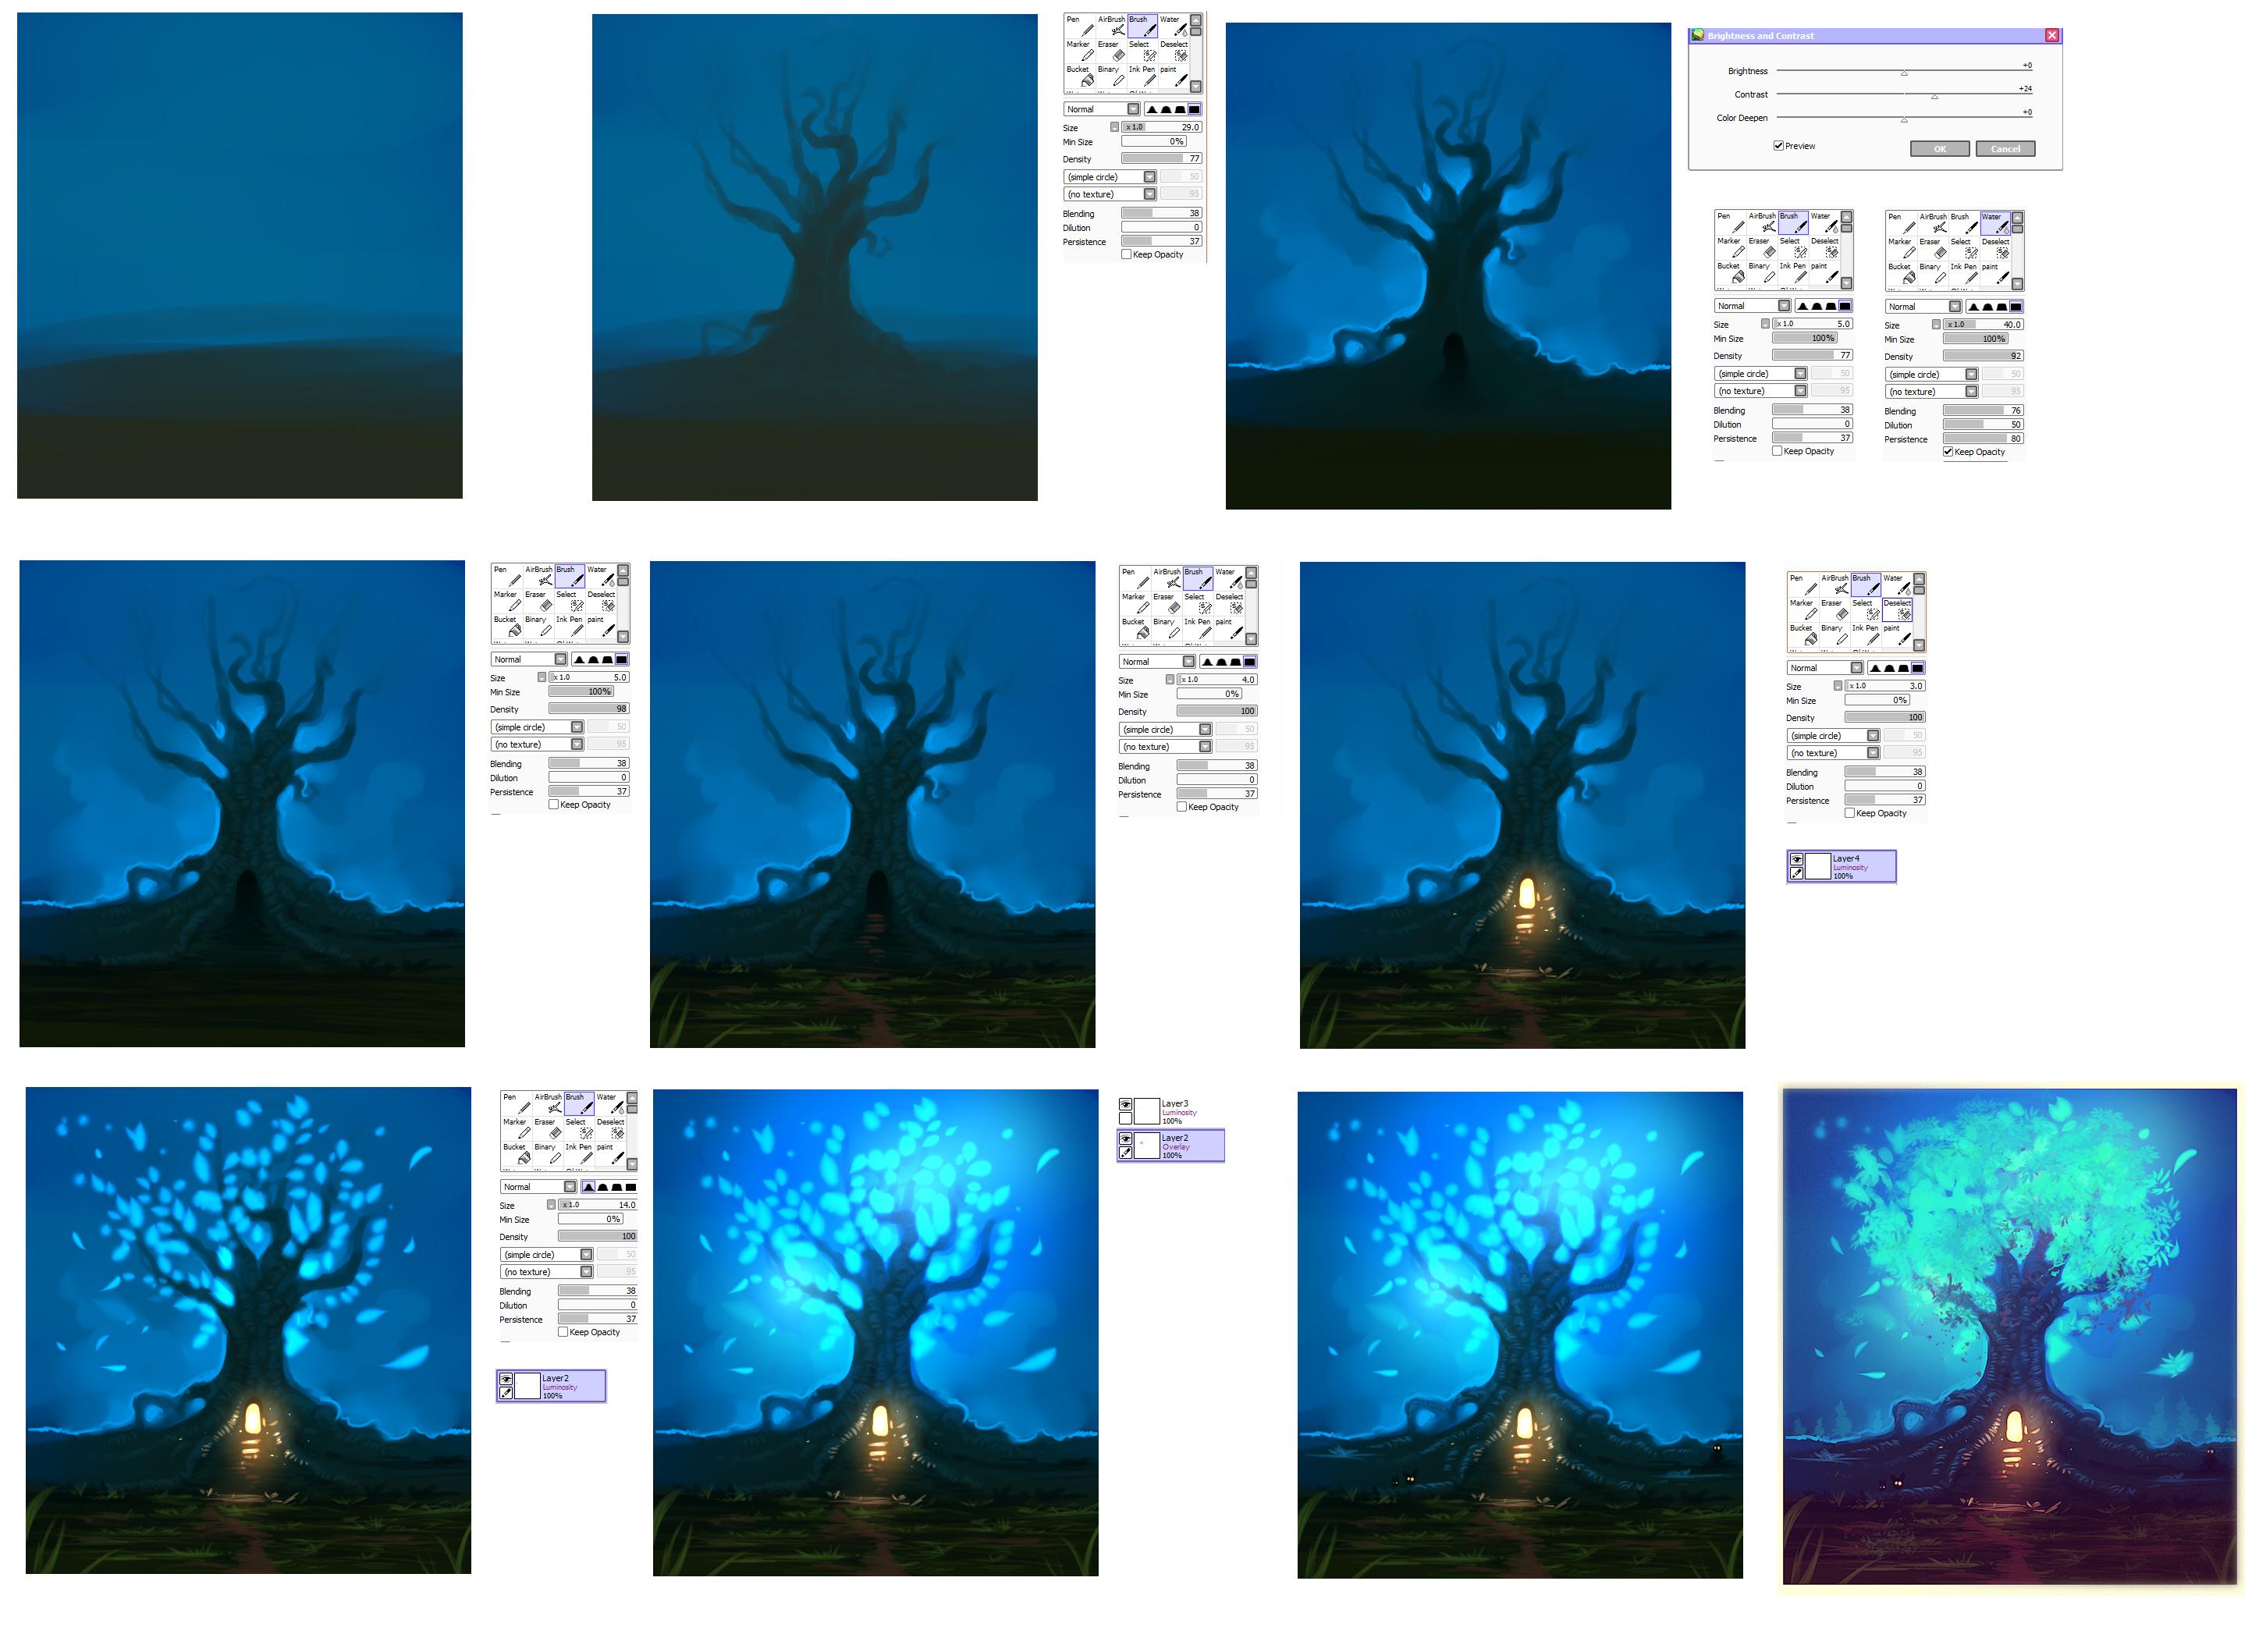 Magic Tree step by step - tutorial